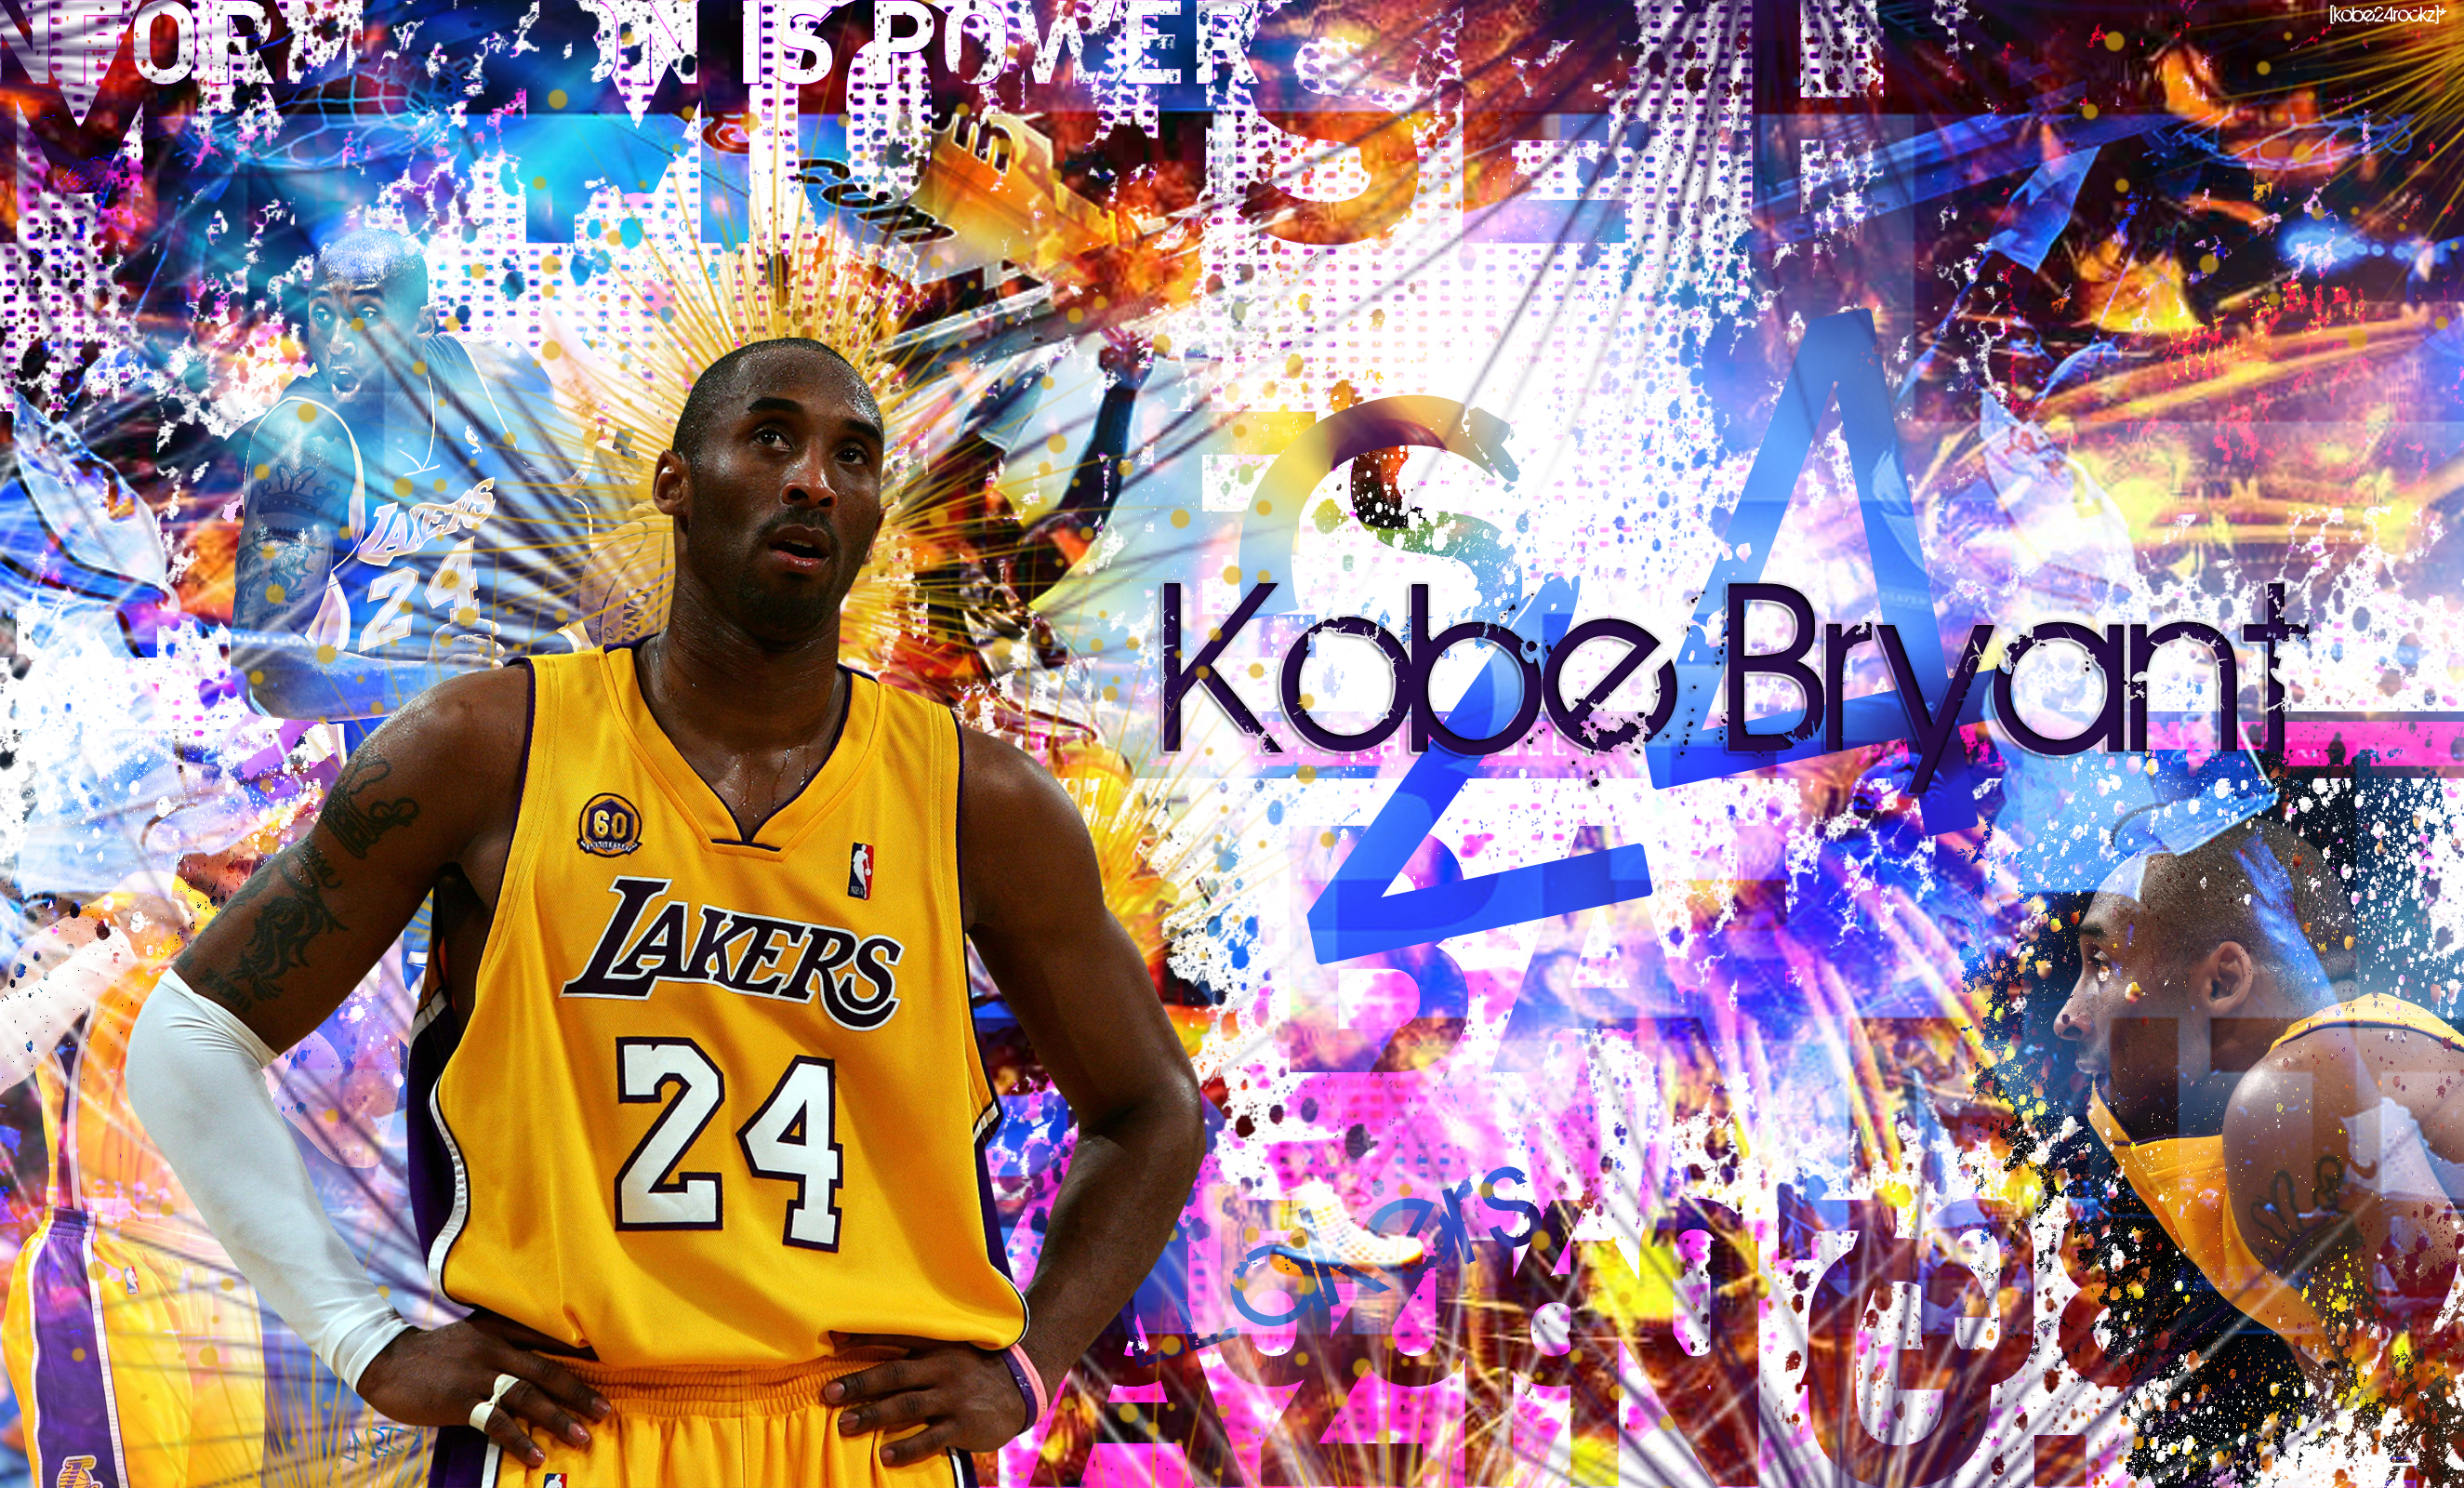 Kobe Bryant Championship Wallpaper 622211   Cool Wallpapers Of 2650x1600